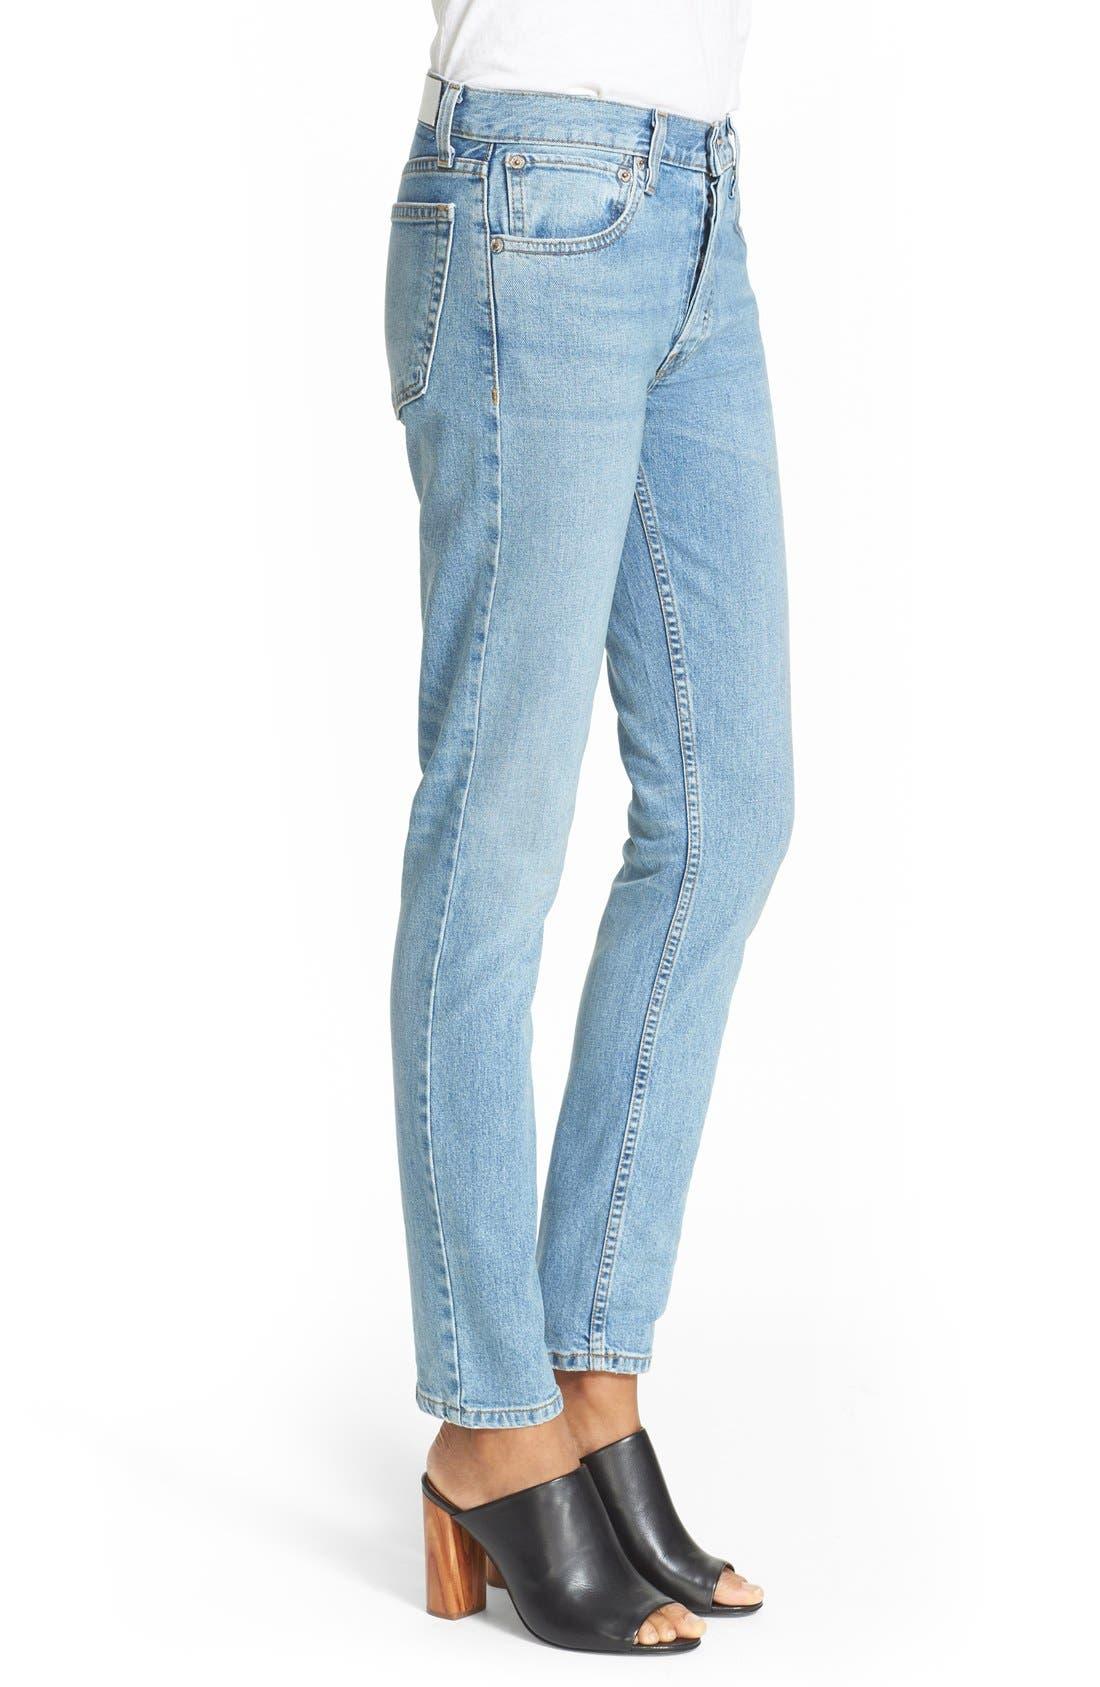 Originals High Waist Straight Skinny Stretch Jeans,                             Alternate thumbnail 3, color,                             Light